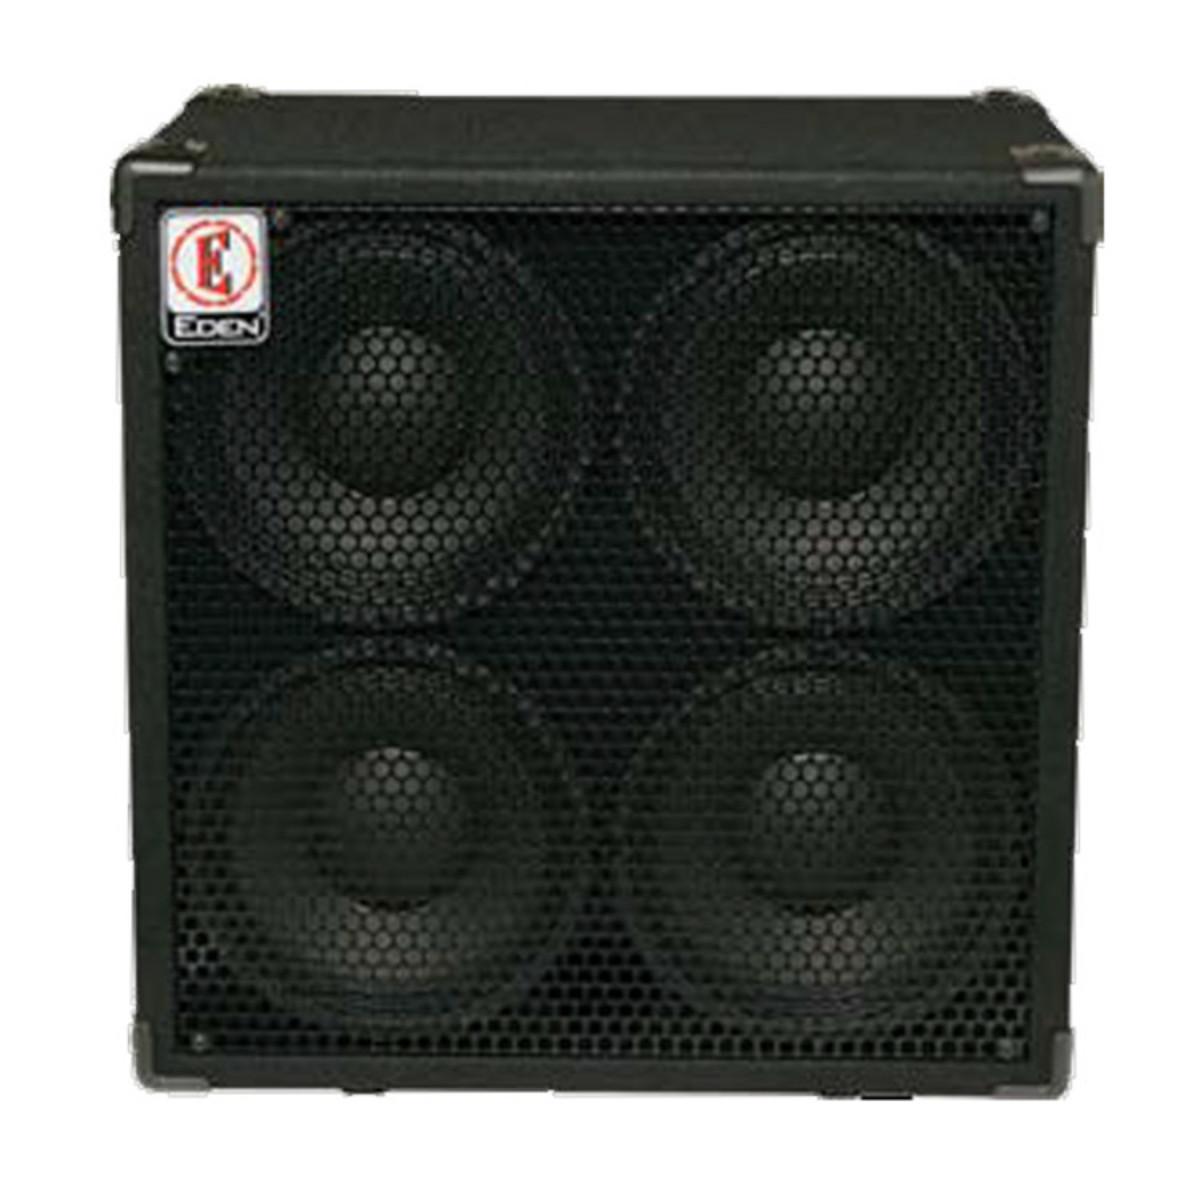 Eden EX410SC 4x10 Bass Cabinet, 400W, 4 ohms at Gear4music.com